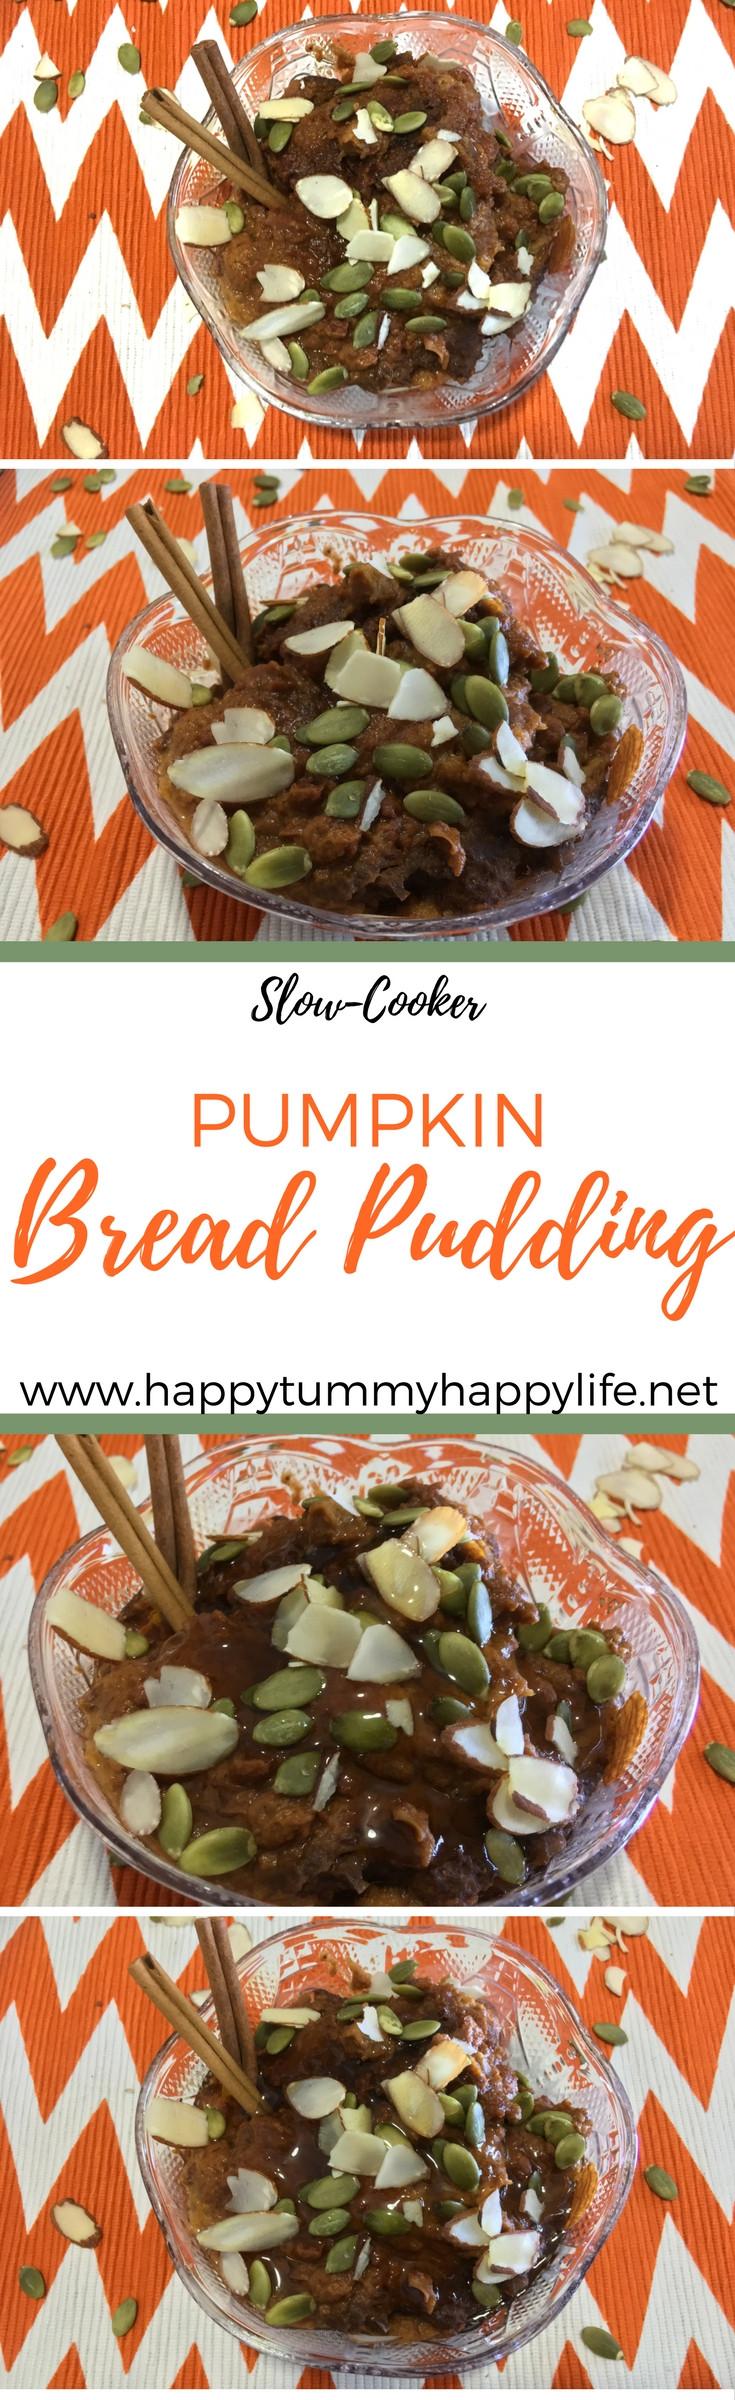 Pumpkin Bread Pudding, Pumpkin Recipes, Dessert Recipes, Easy Recipes, Crockpot Recipes, Slowcooker Recipes, Breakfast Recipes, Fall Recipes, Thanksgiving